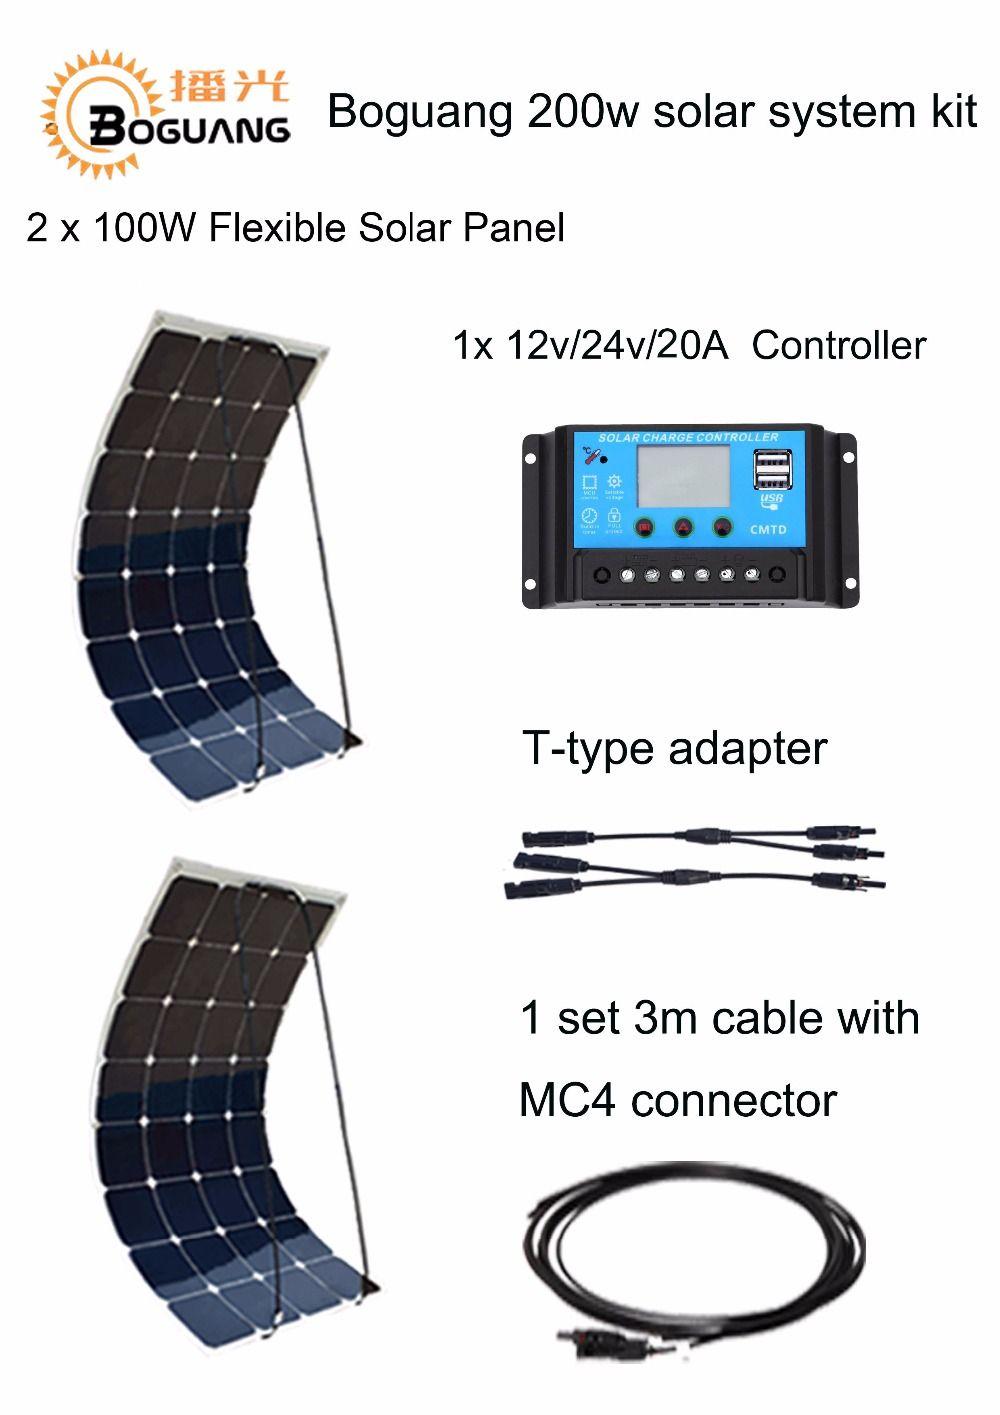 Flexible Solar Panel 2 stücke 100 w Kabel 12 v Oder 24 v 20a Controller Usb Ausgang Haus 200 watt kits Diy System Solar Power Station Home